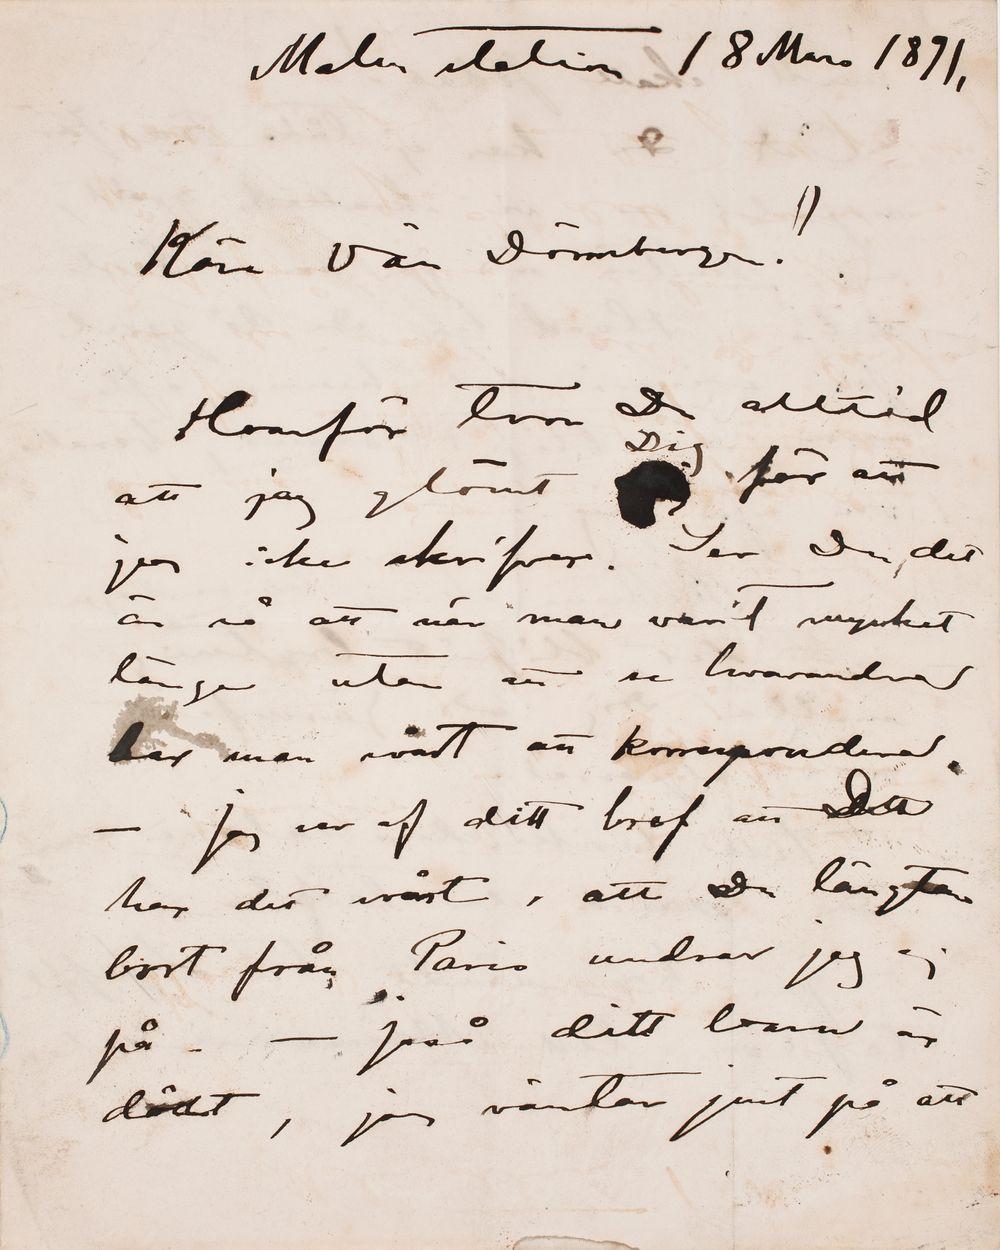 Akseli Gallen-Kallelan kirje Carl Dørnbergerille 18.3.1891